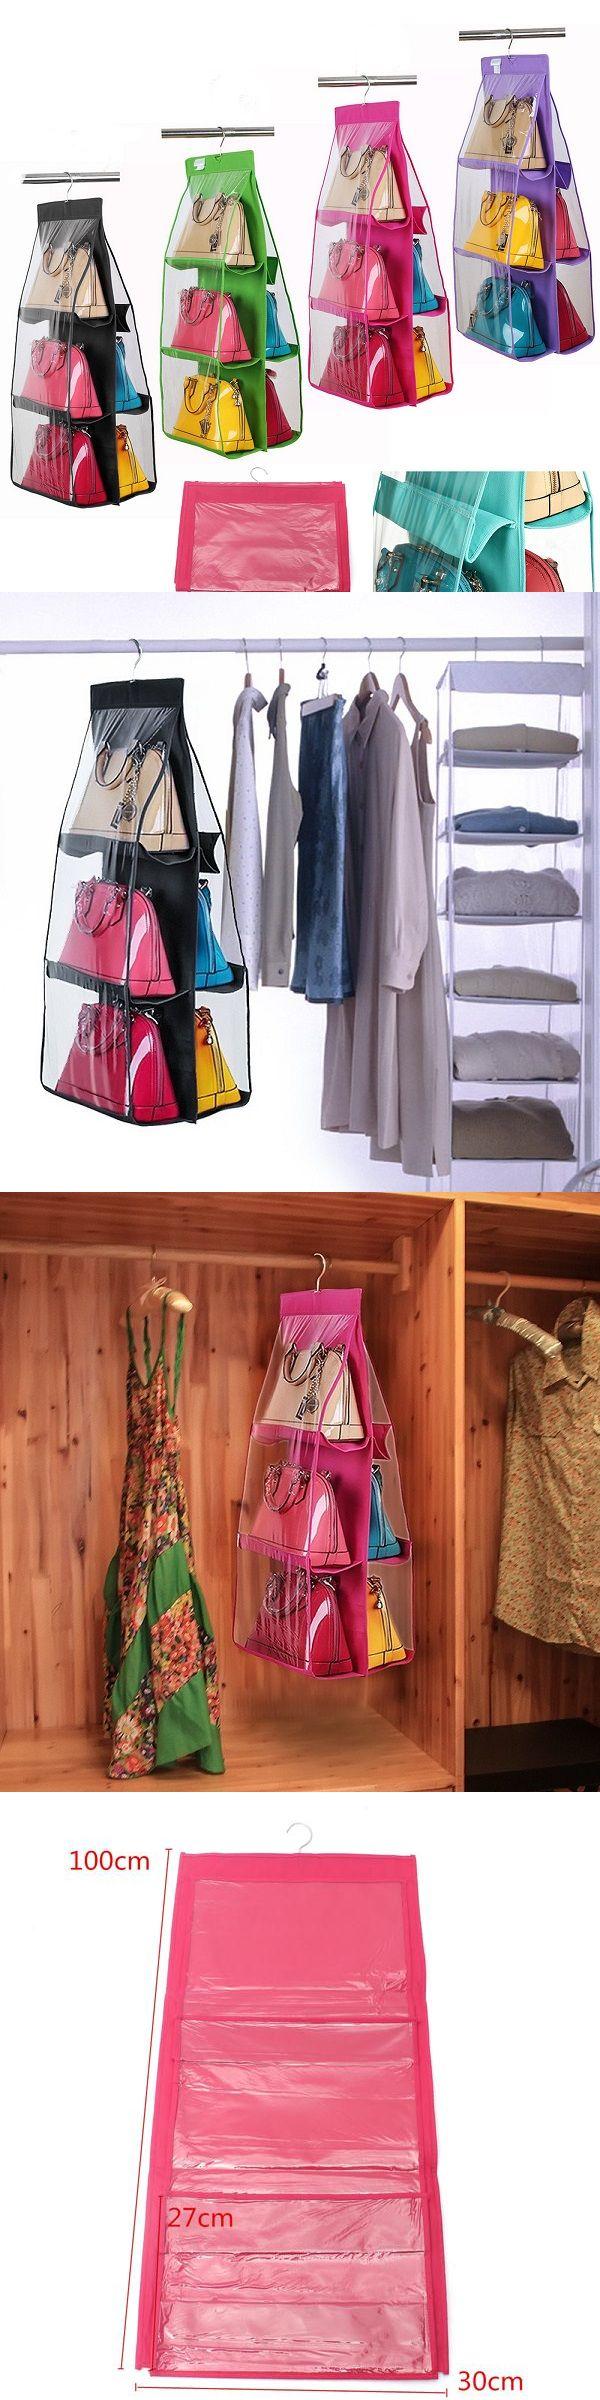 17 Best ideas about Purse Organizer Closet on Pinterest | Purse organization,  Bag organization and Handbag organization